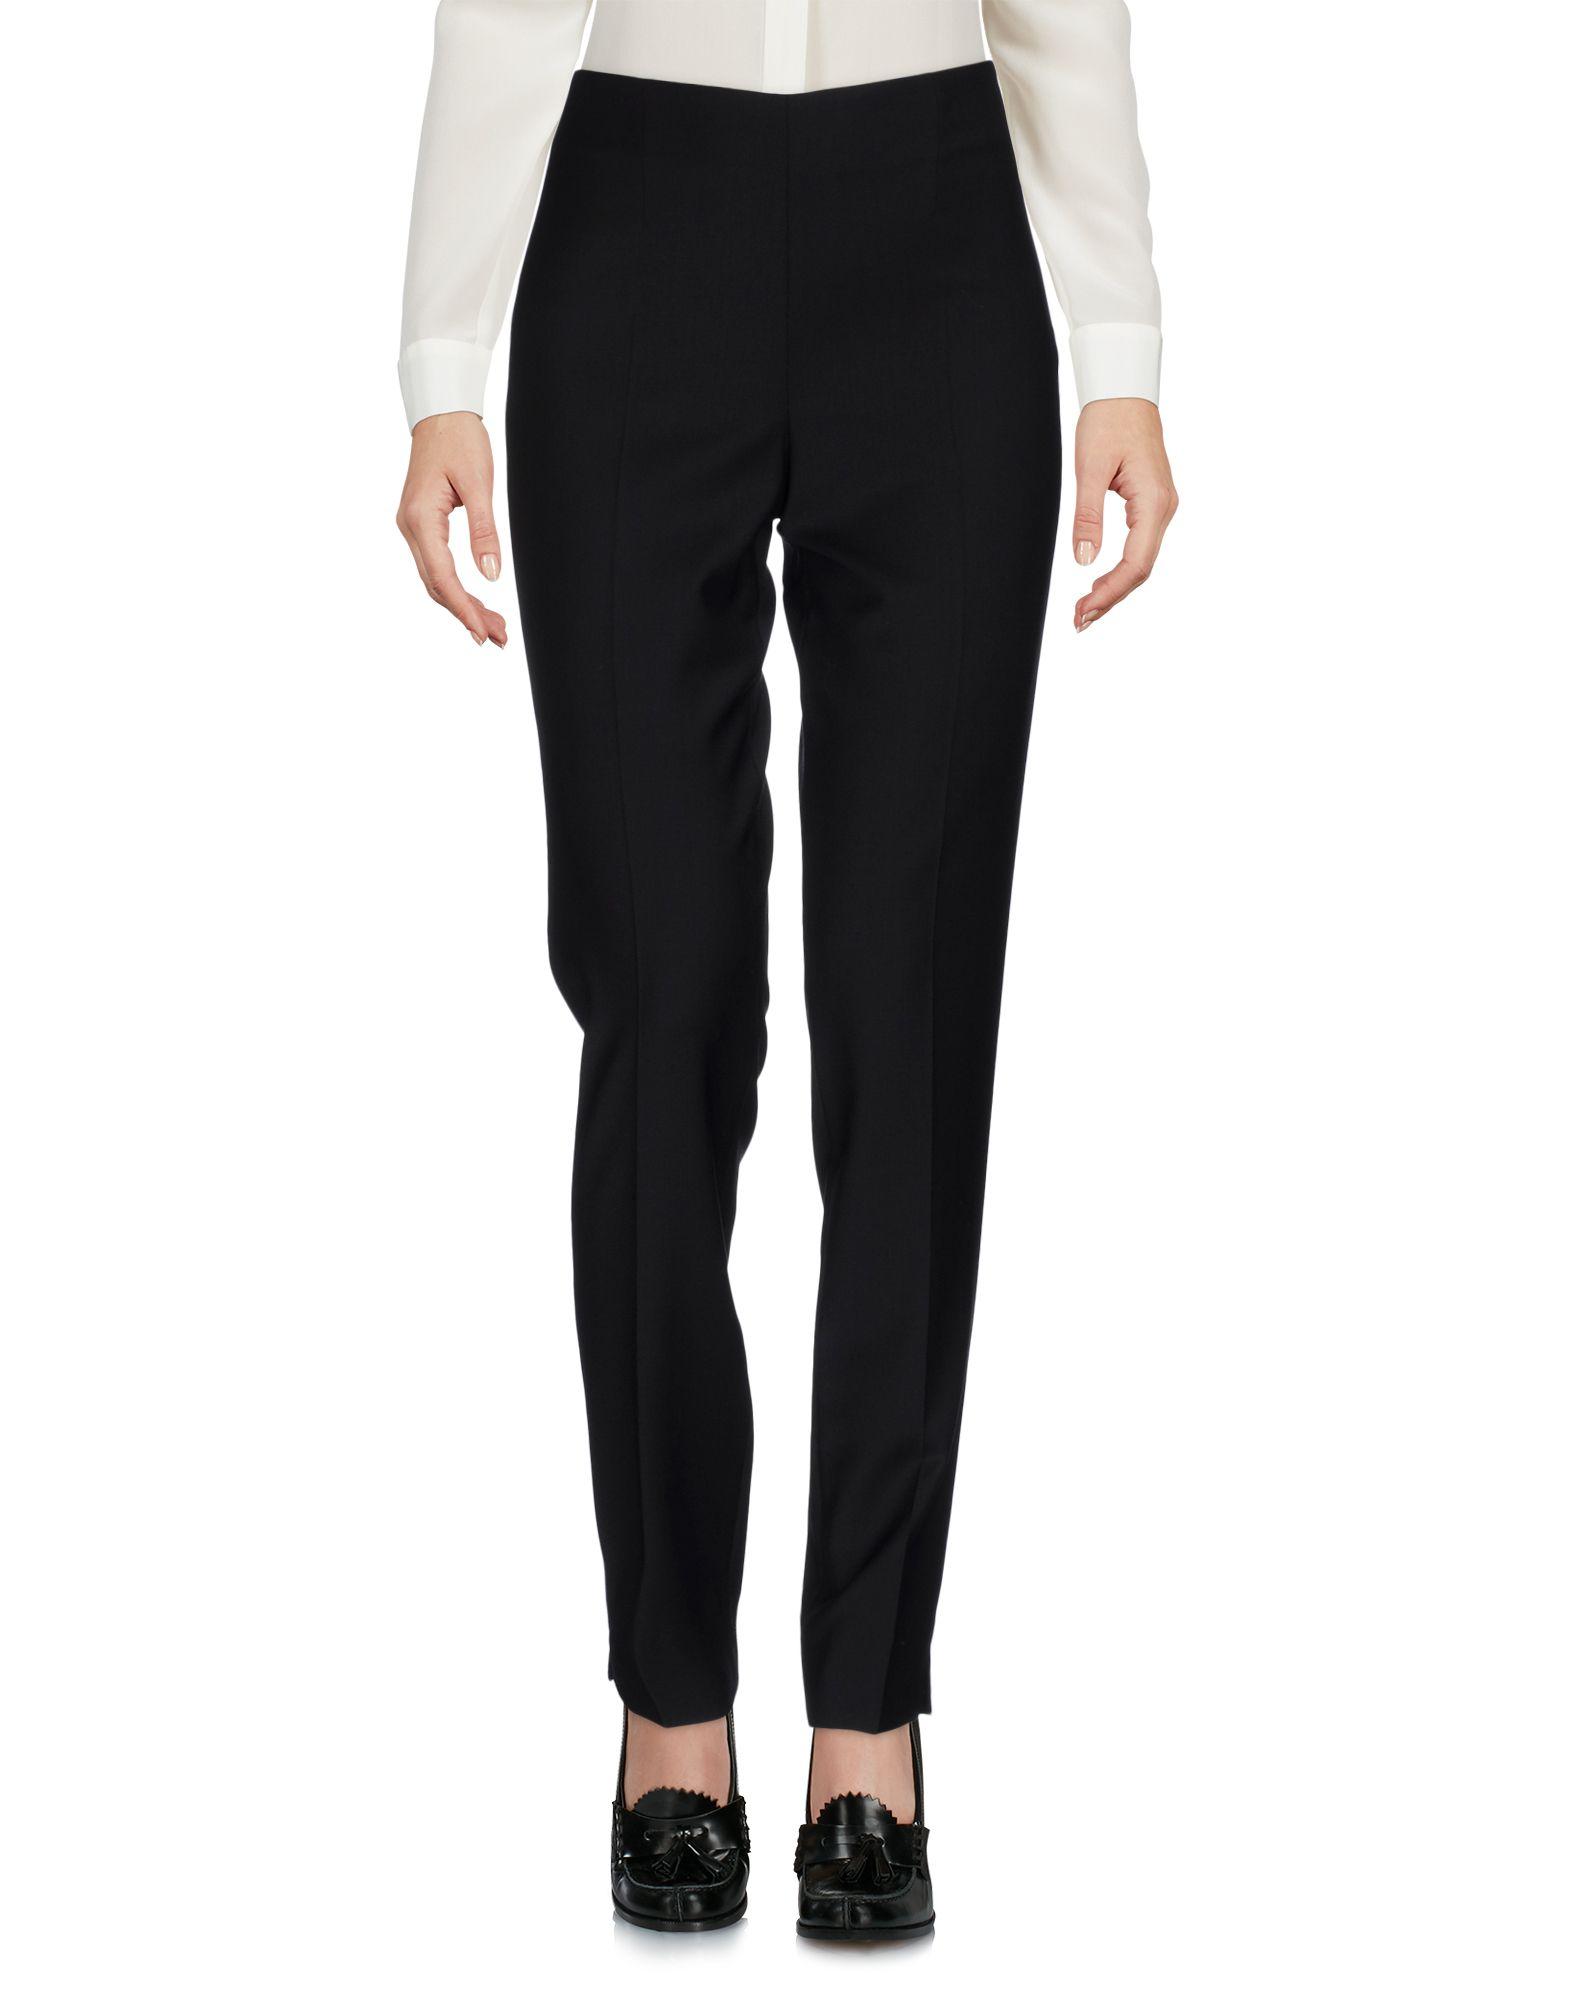 Pantalone Incotex Donna - Acquista online su K1KrG5e